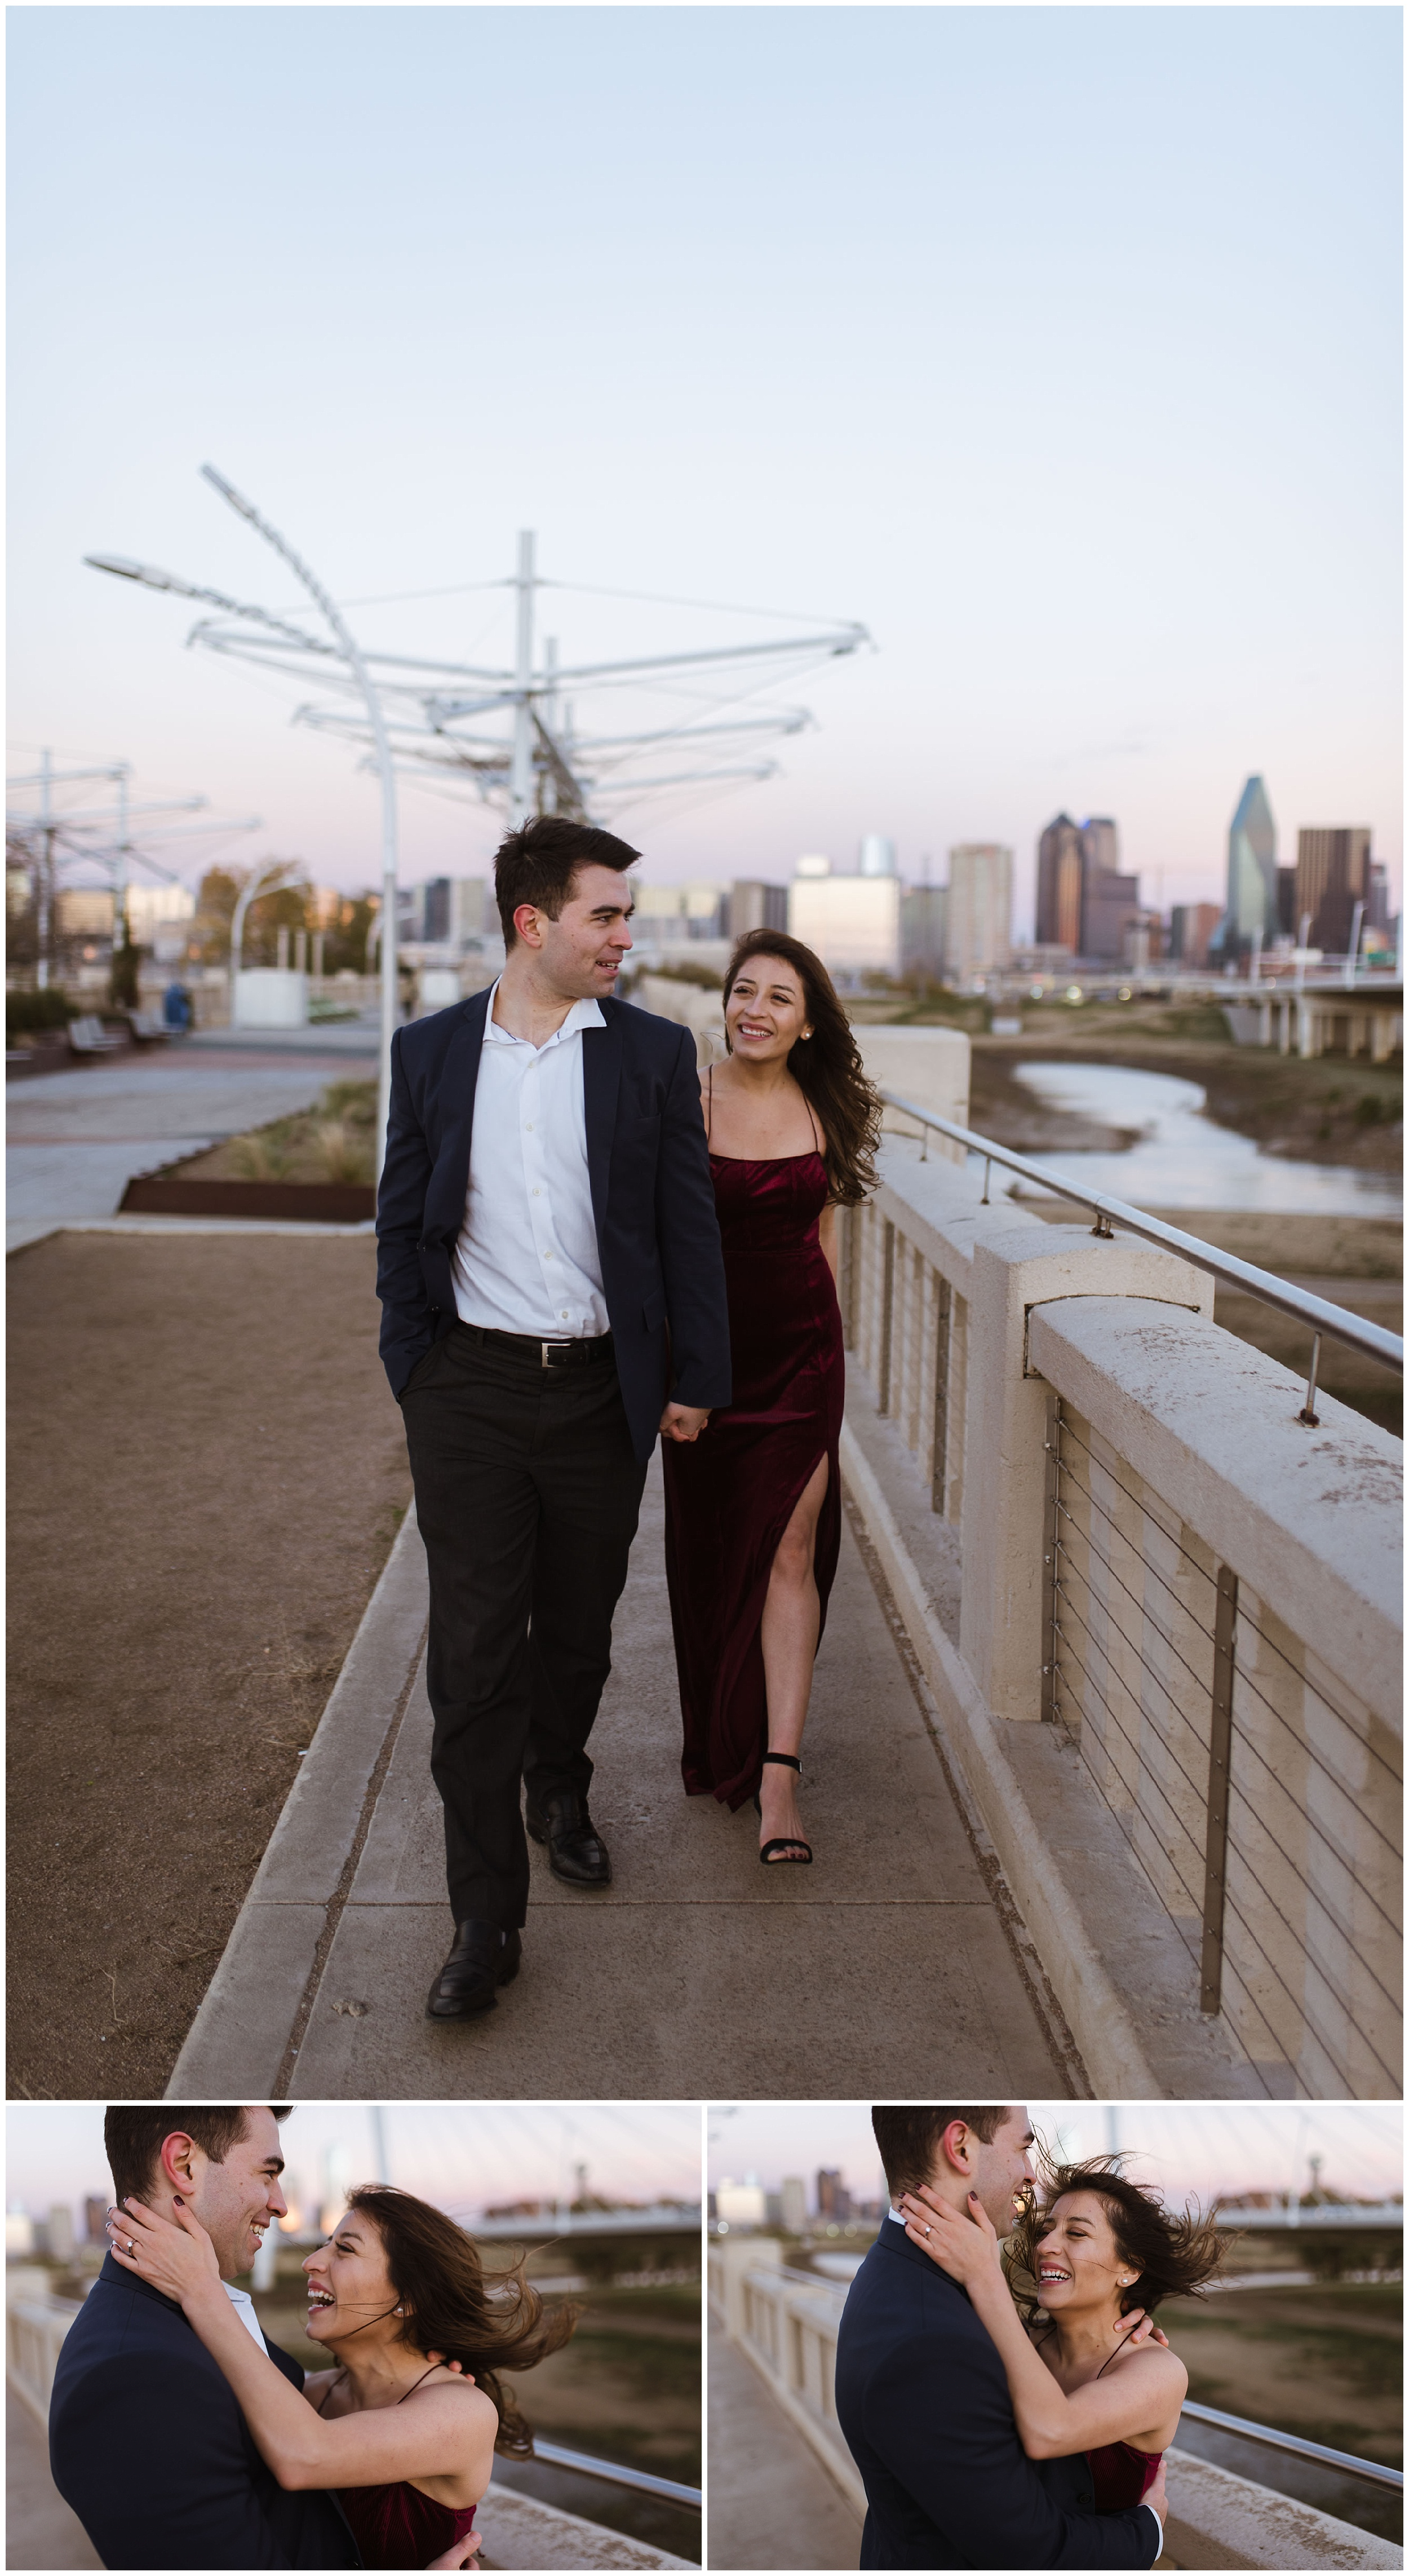 Dallas Engagement Session   Fort Worth Wedding Photographer   Dallas Wedding Photographer   www.jordanmitchellphotography.com